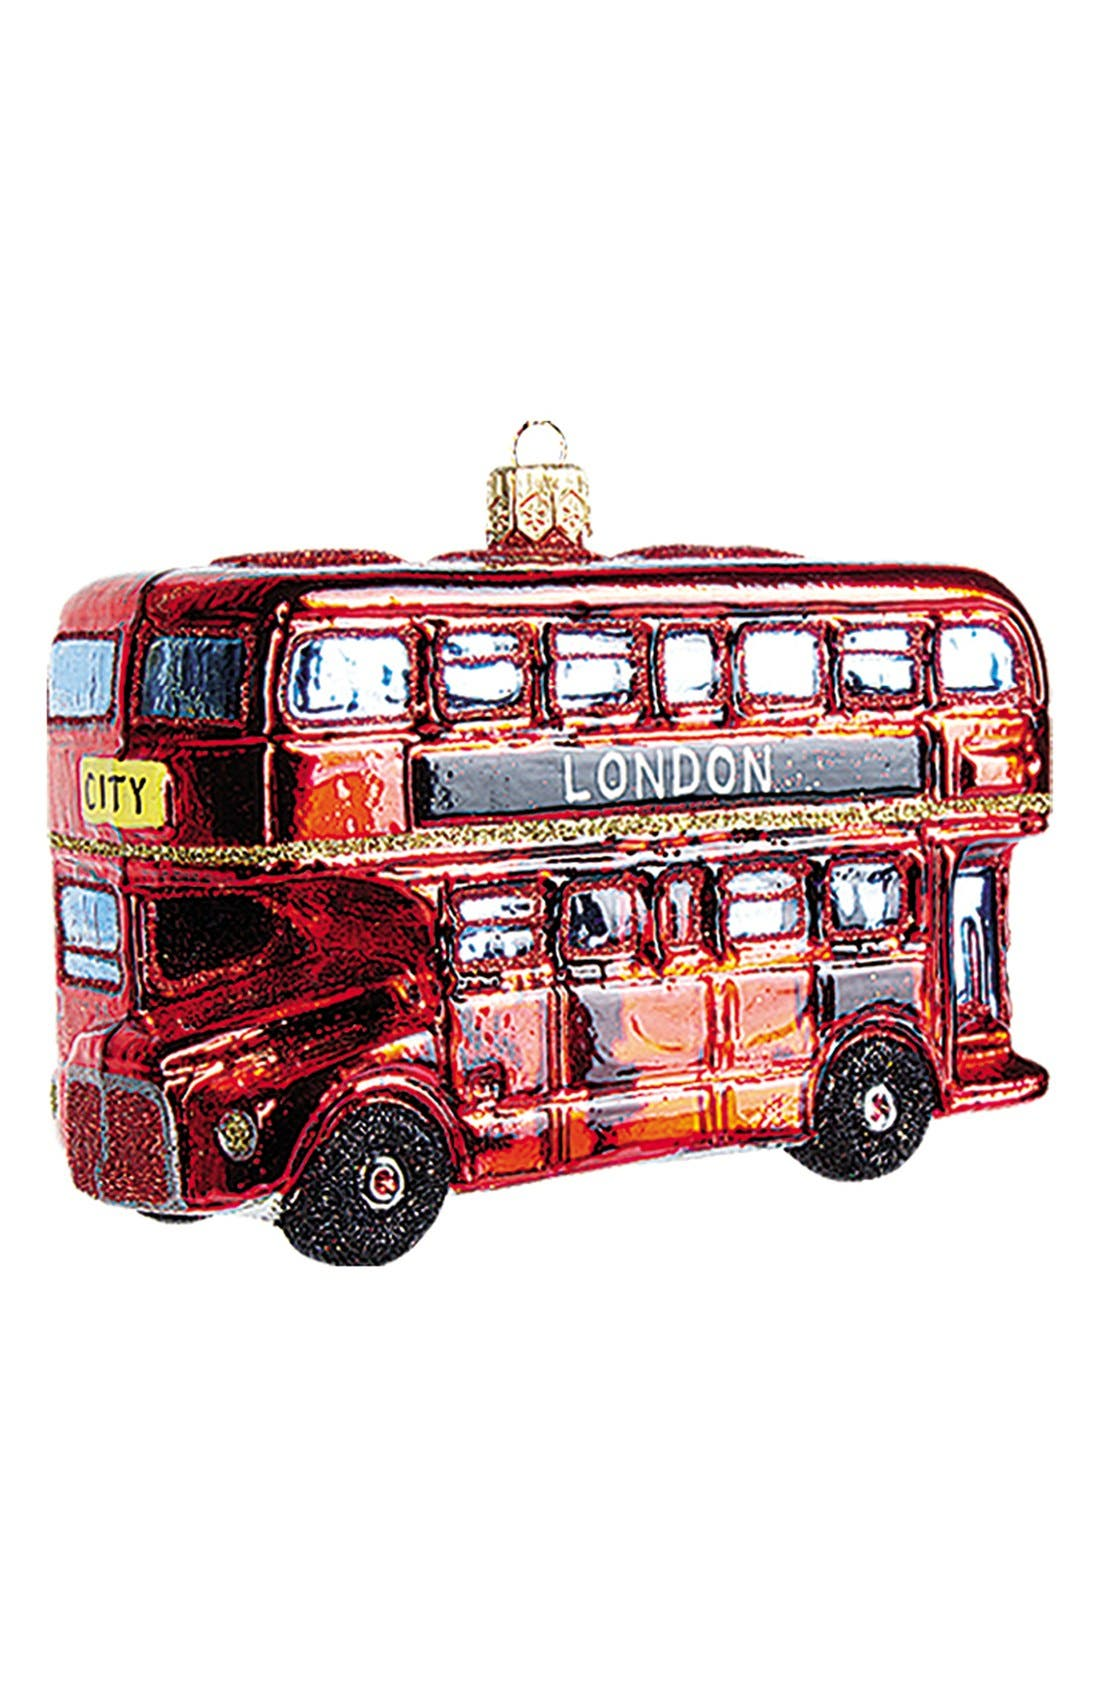 London Bus Handblown Glass Ornament,                             Main thumbnail 1, color,                             600